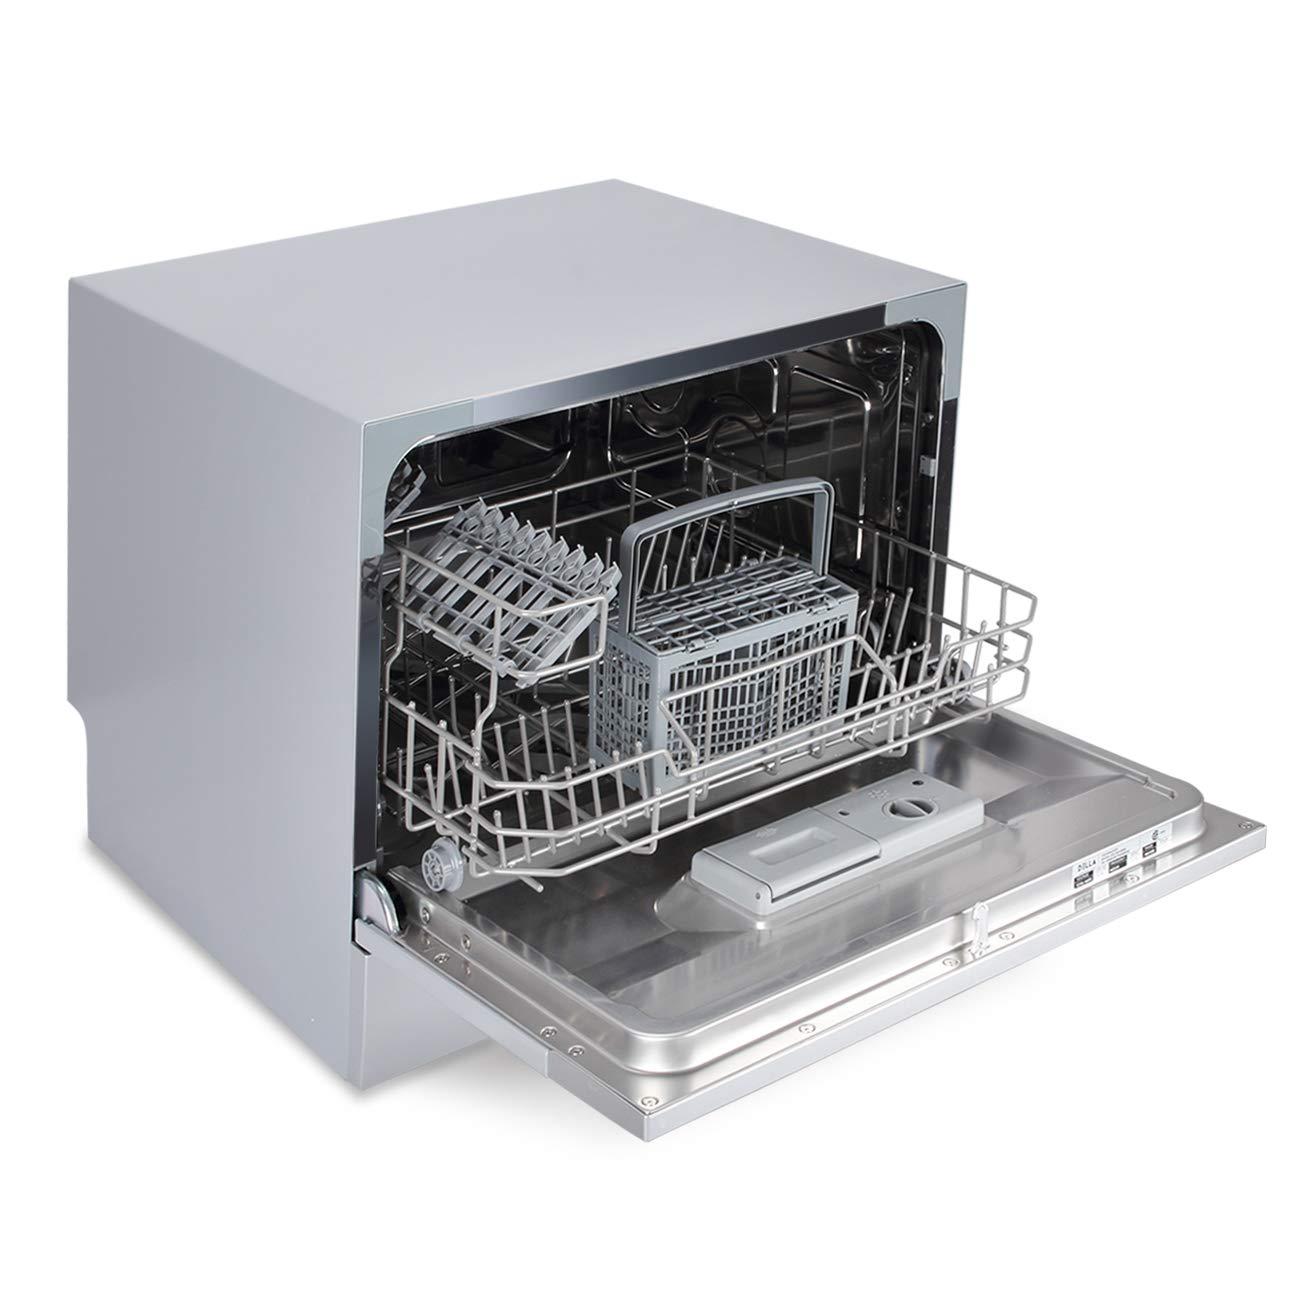 Silver DELLA Compact Mini Dishwasher with 6 Wash Cycles Small Setting Capacity Plate for Office RV Condo Apartment Kitchen